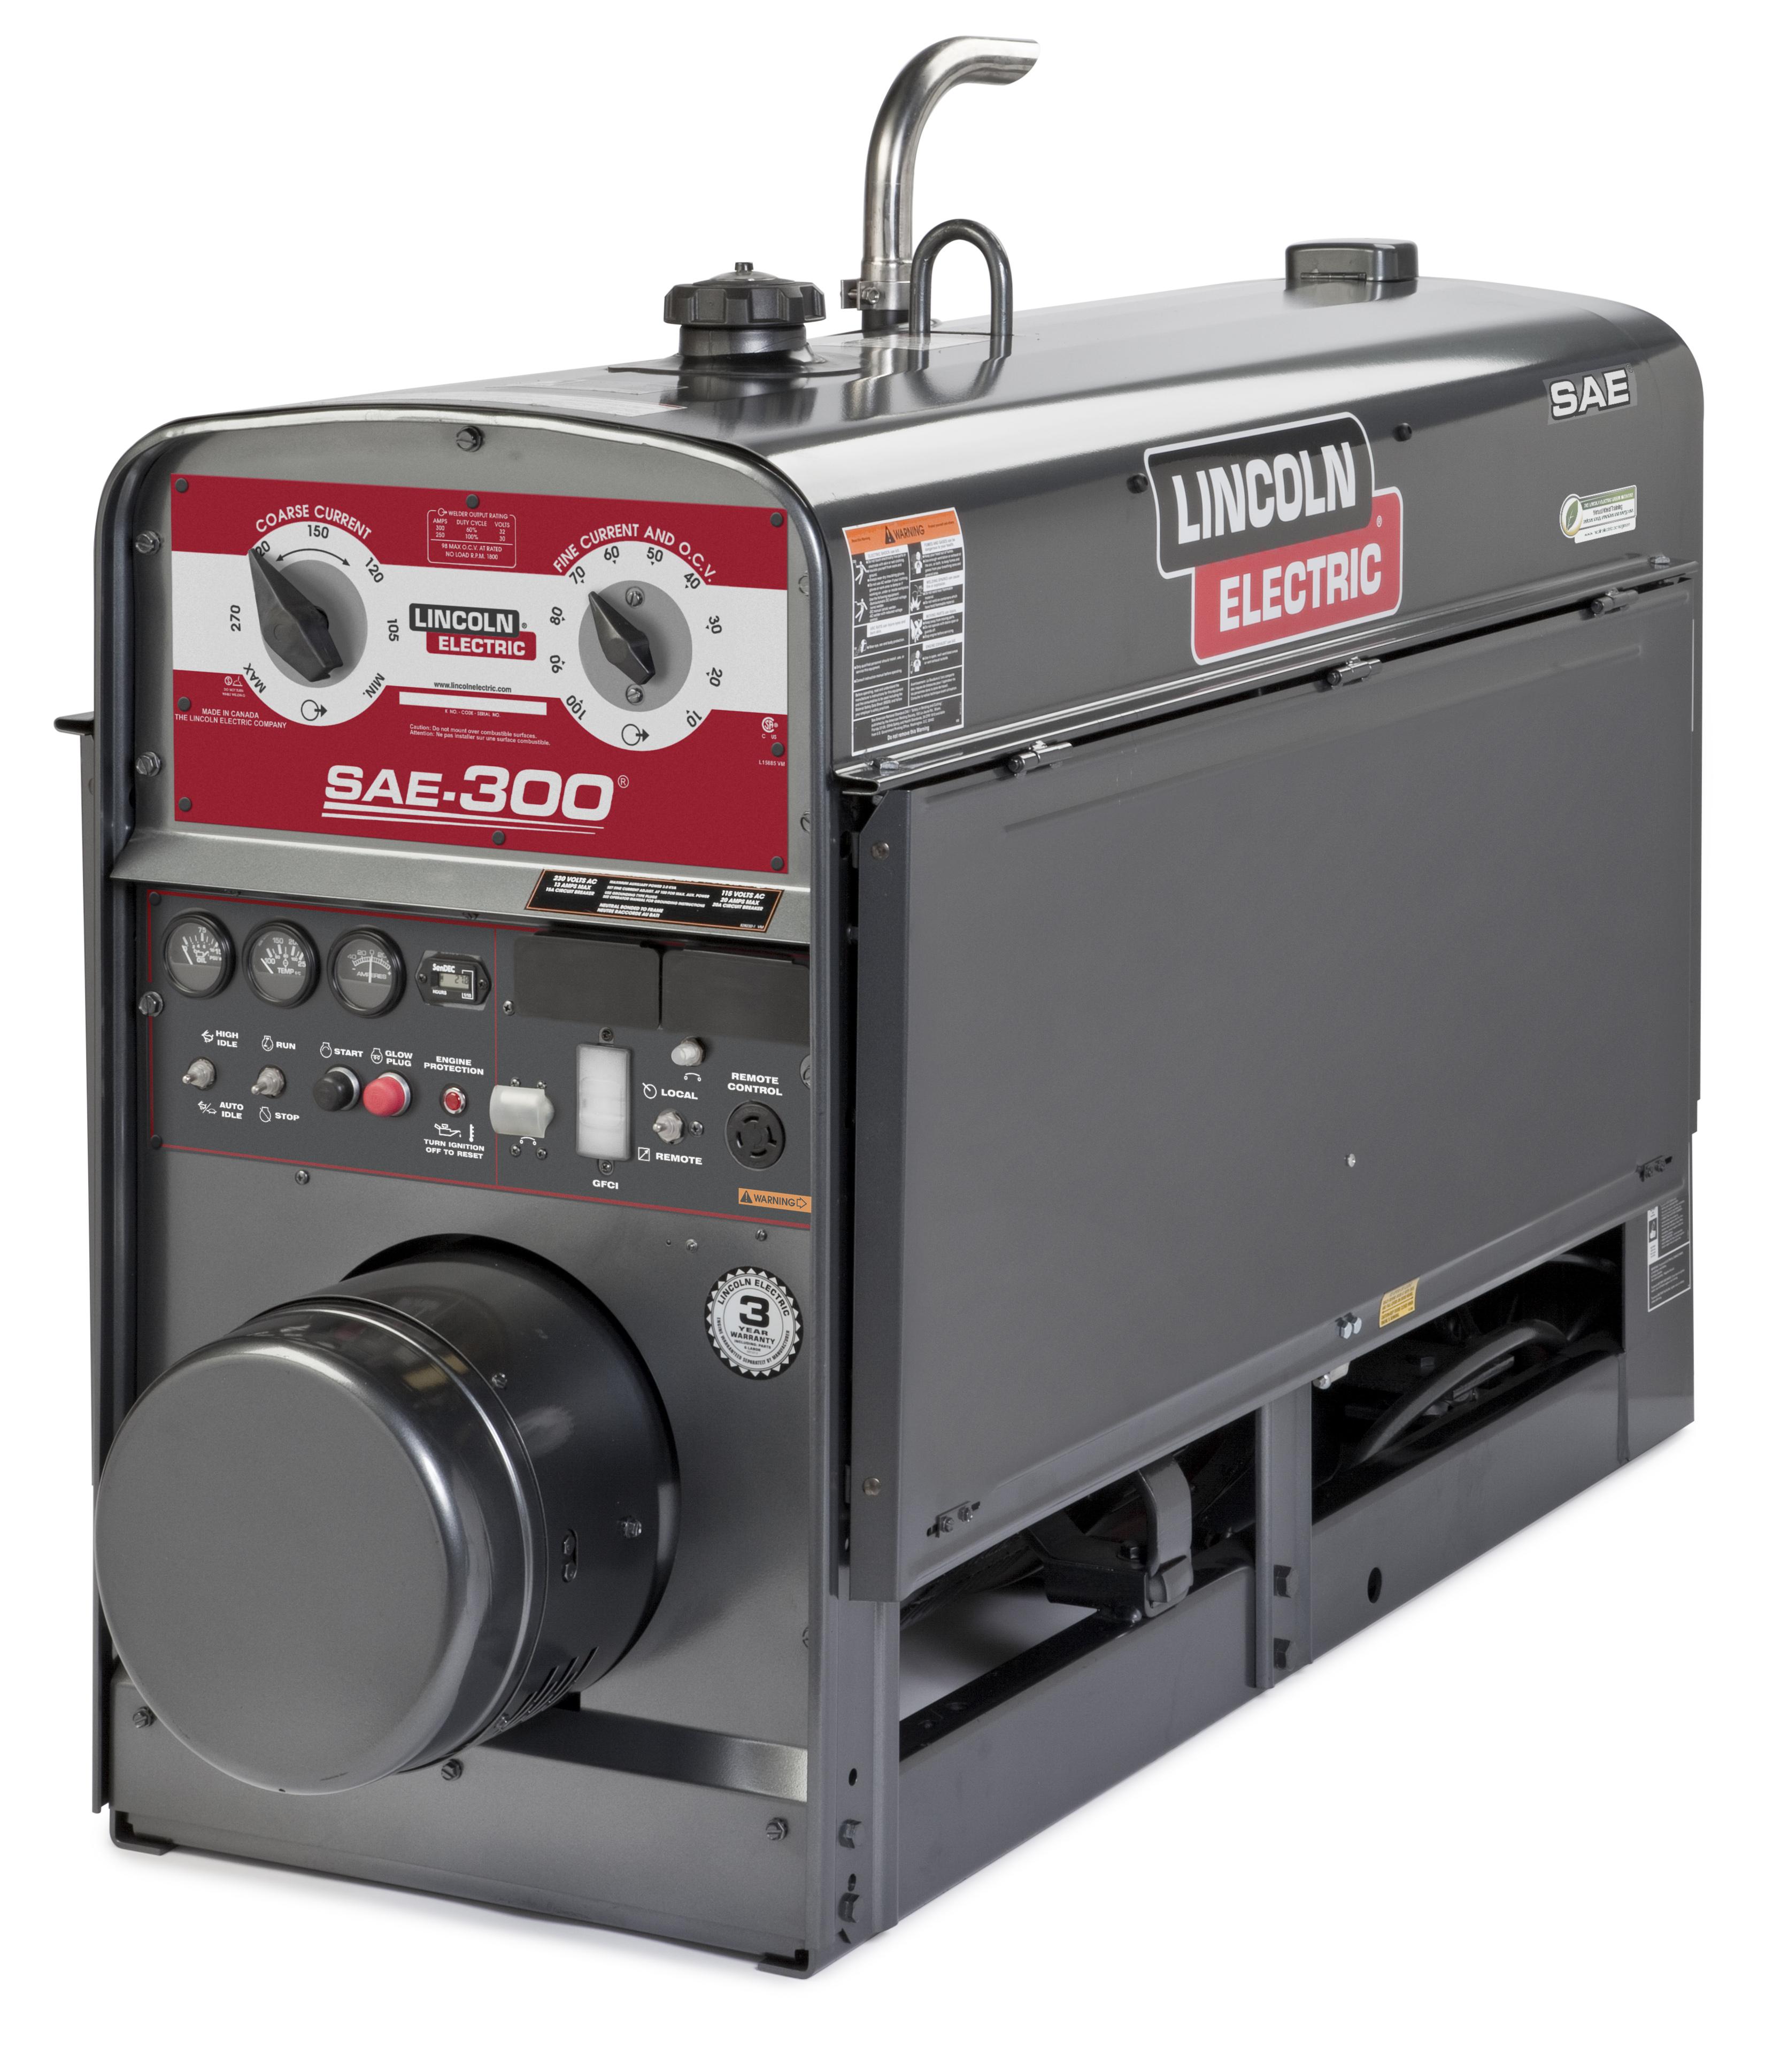 welder engine bulldog wire driven review lincoln generator best